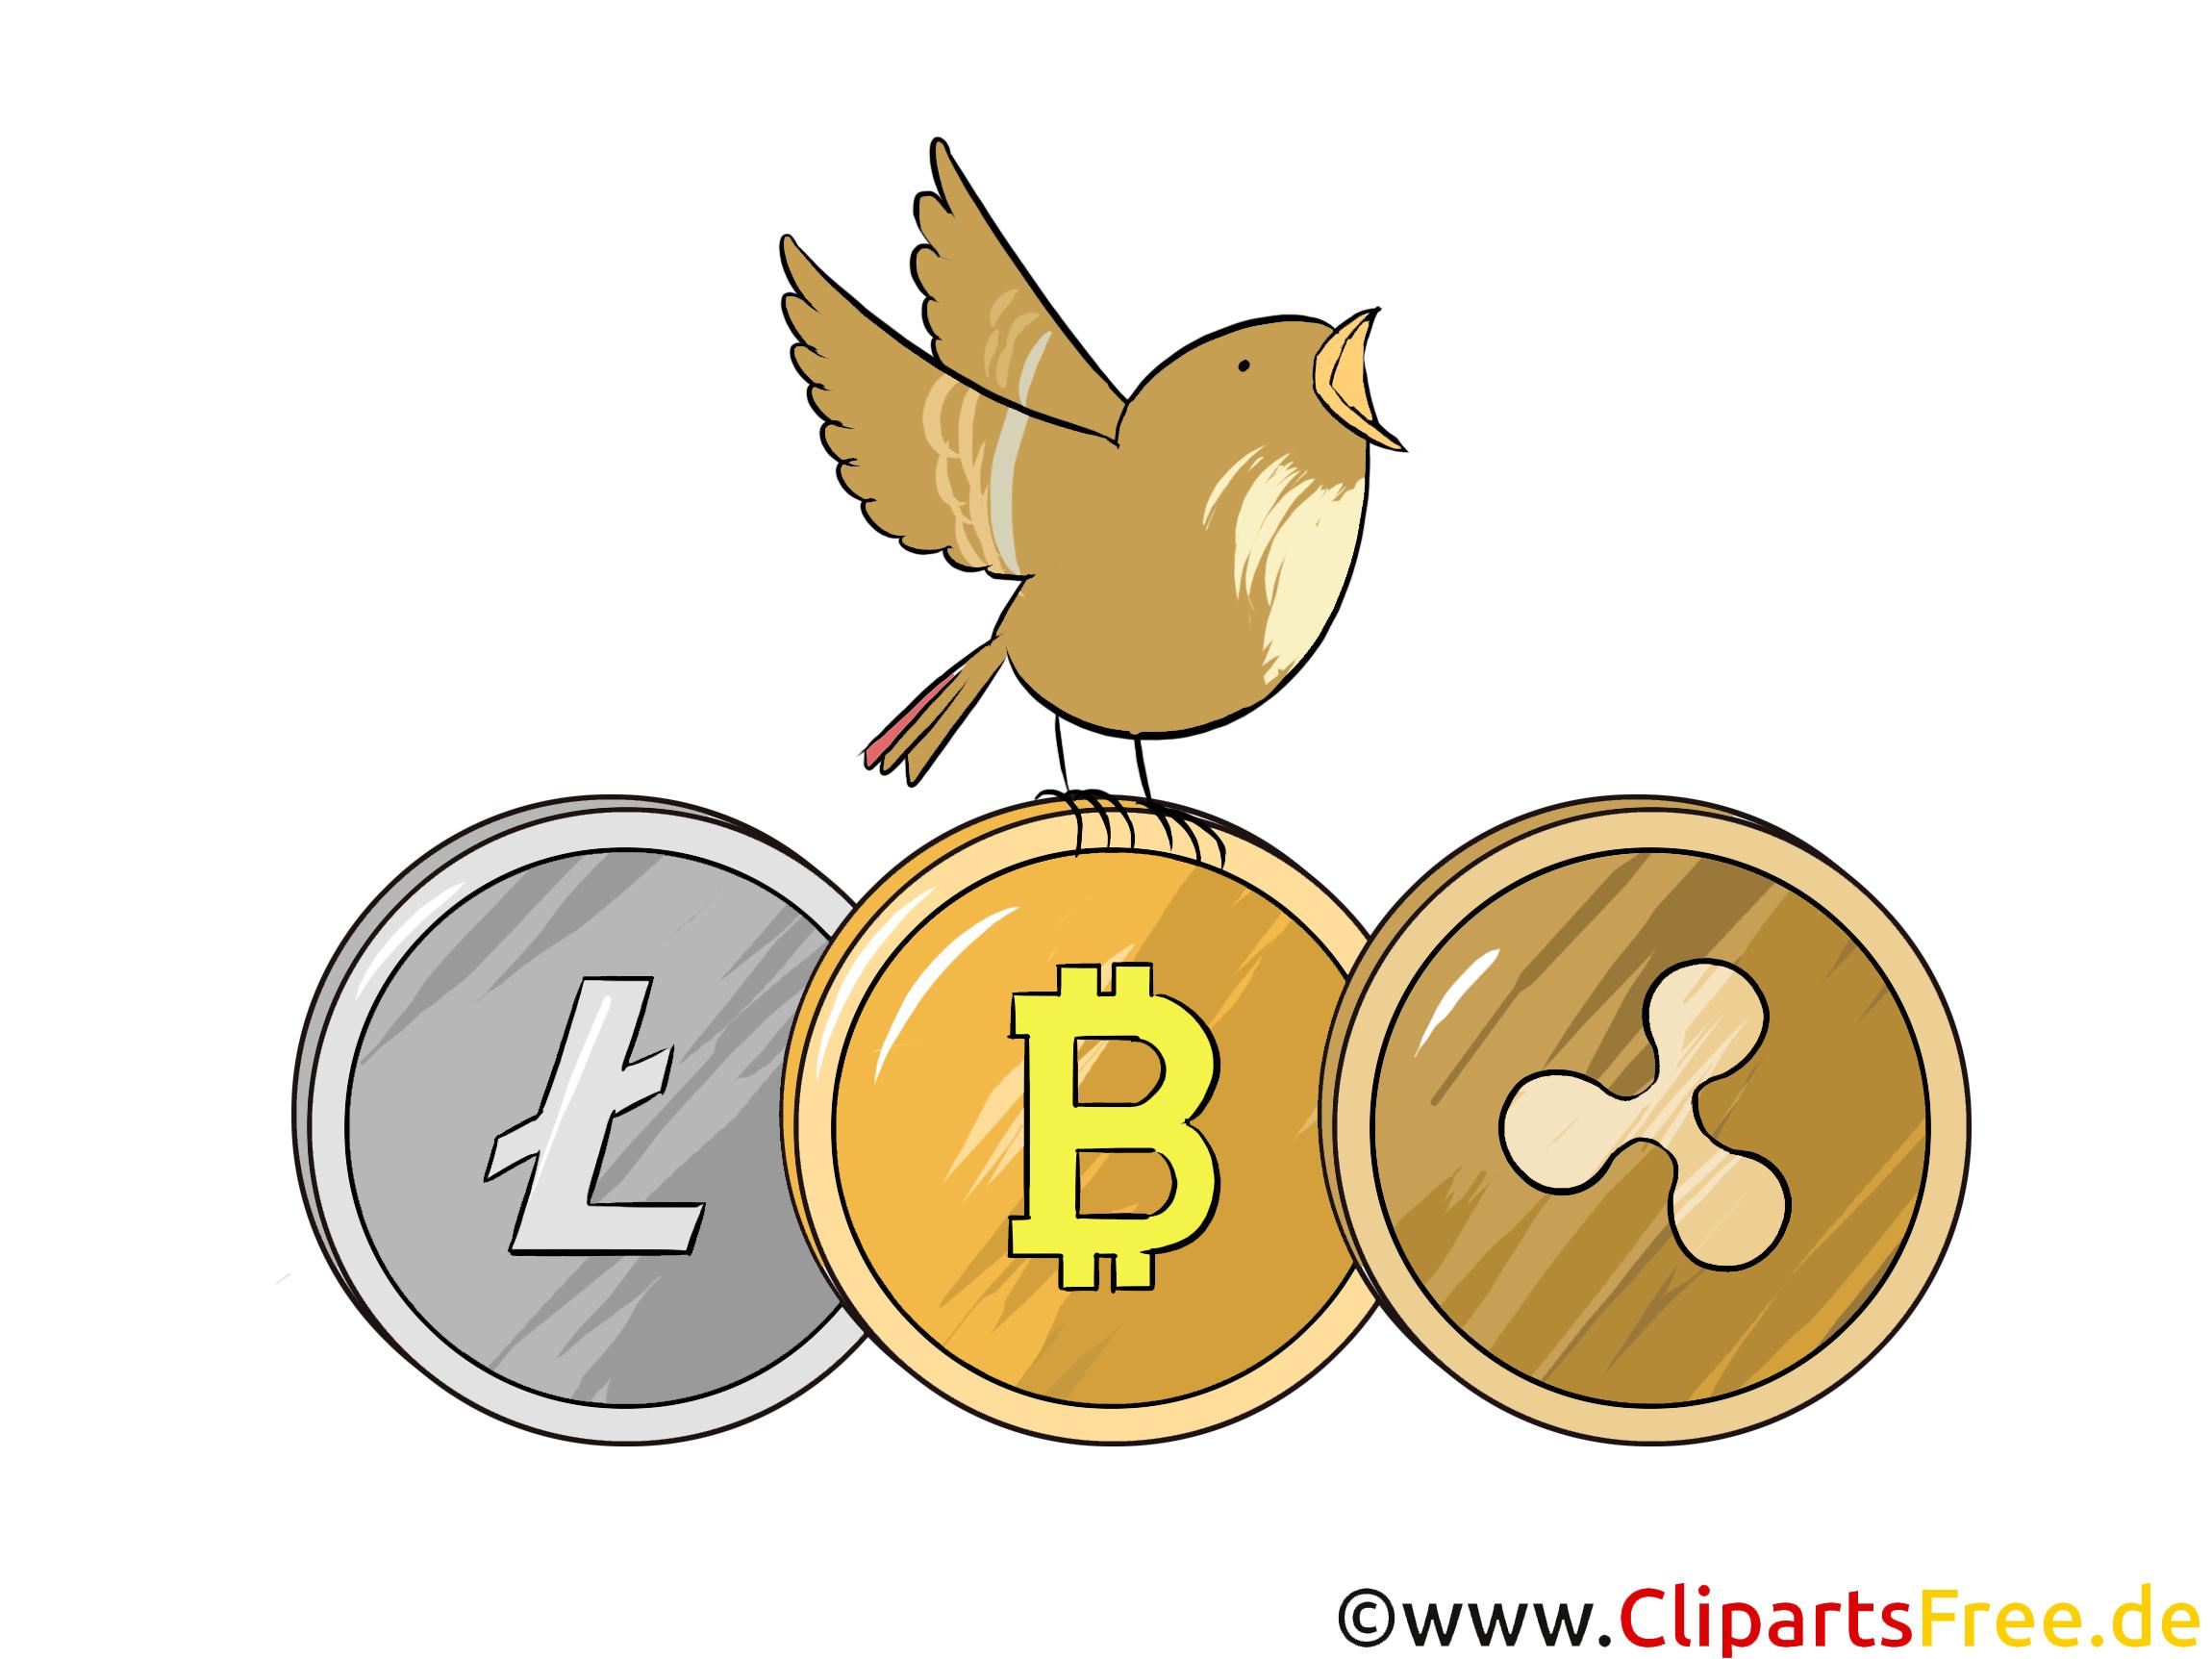 Bitcoin und Altcoins Clipart